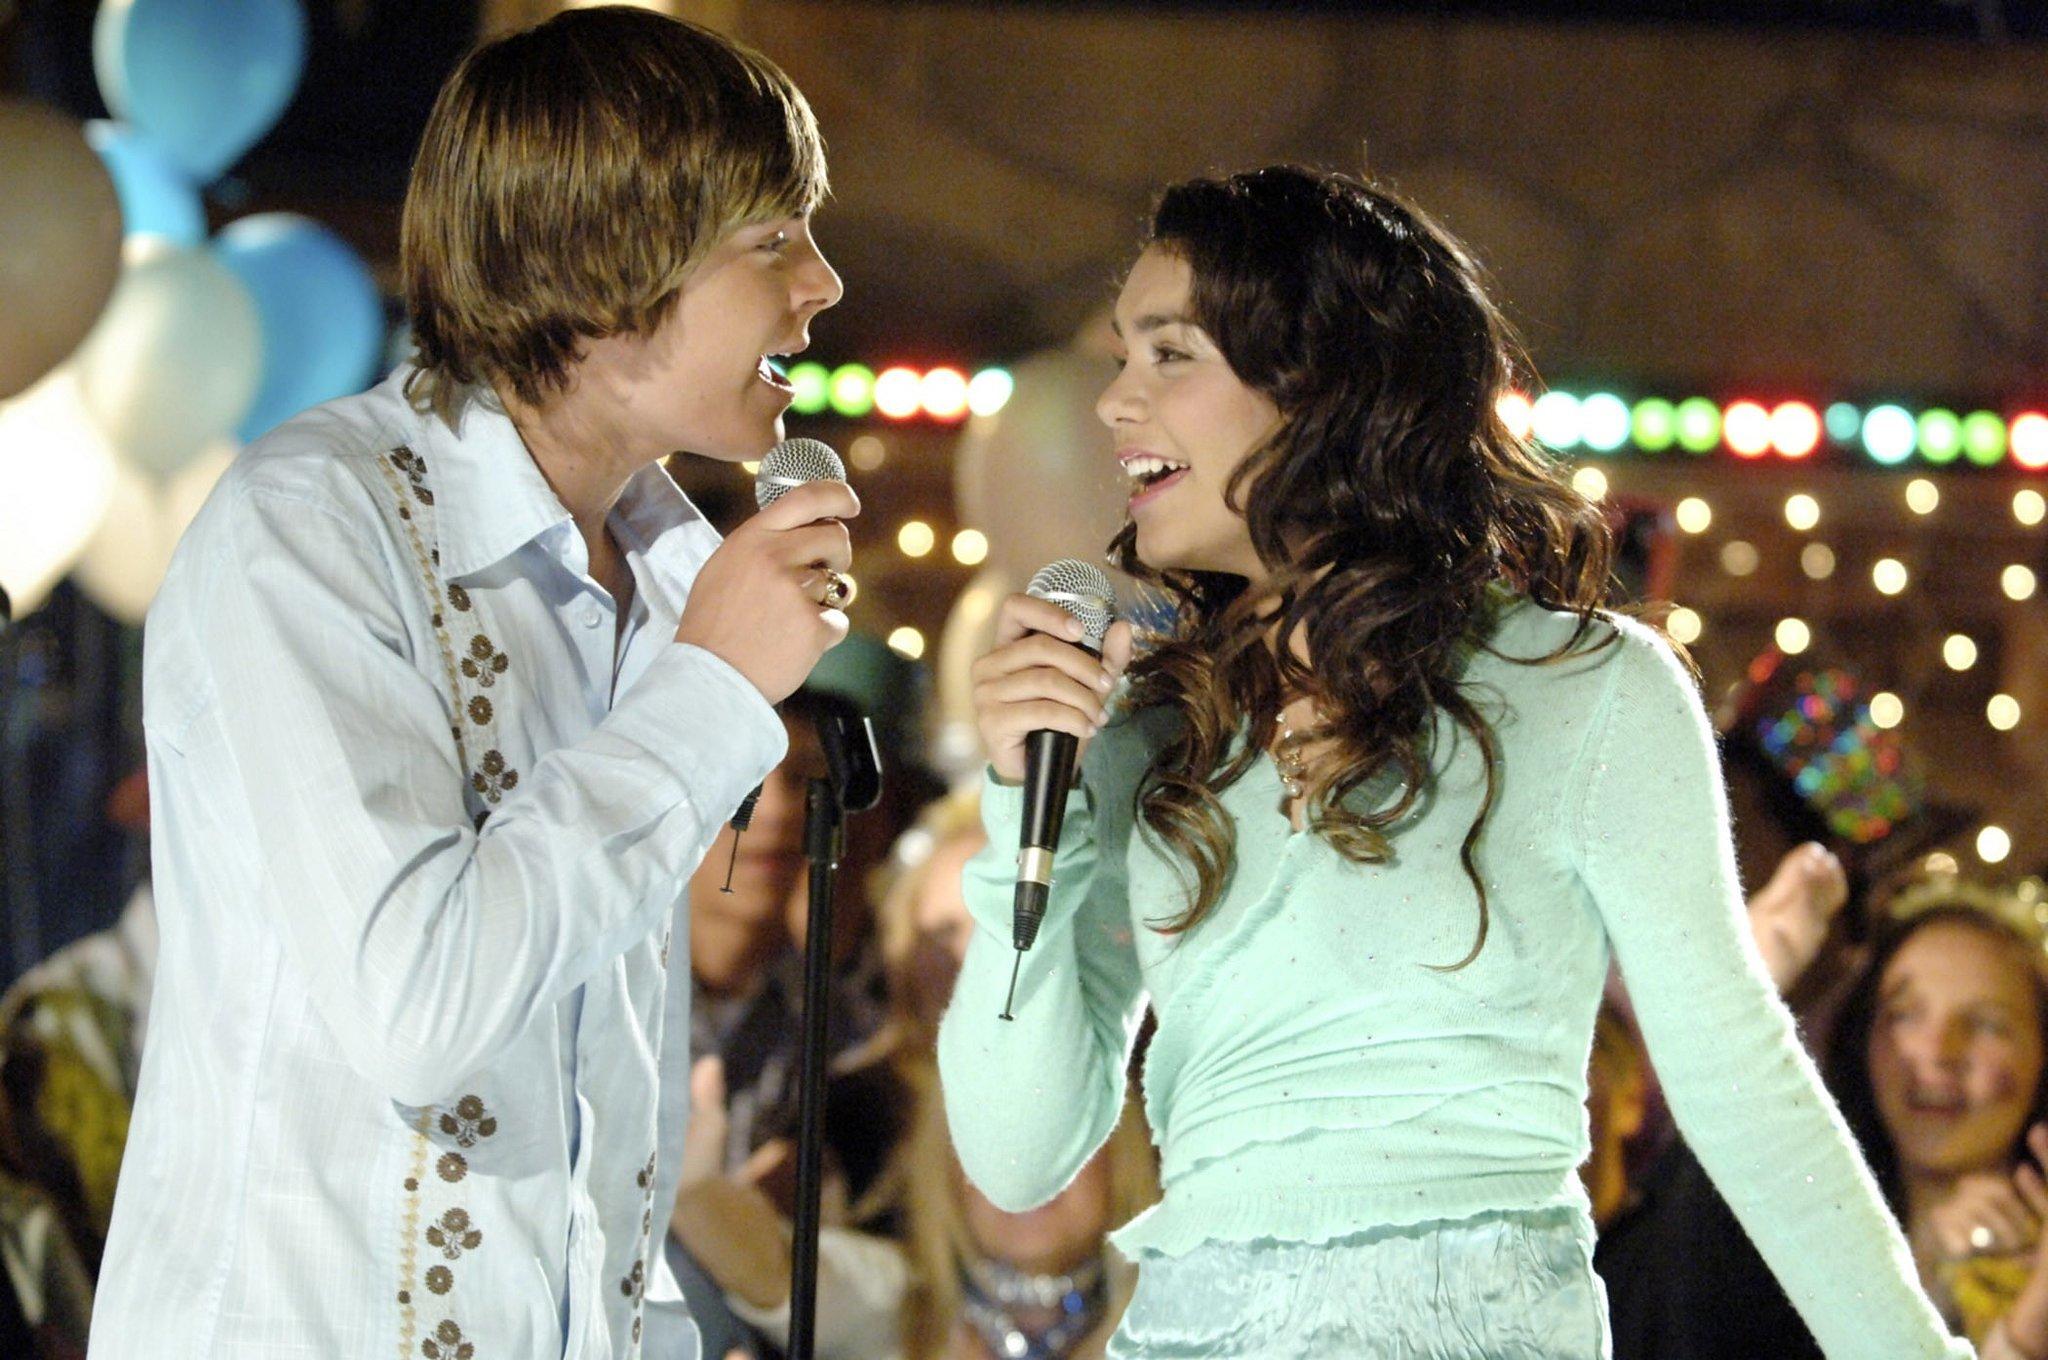 Zac Efron and Vanessa Hudgens, High School Musical